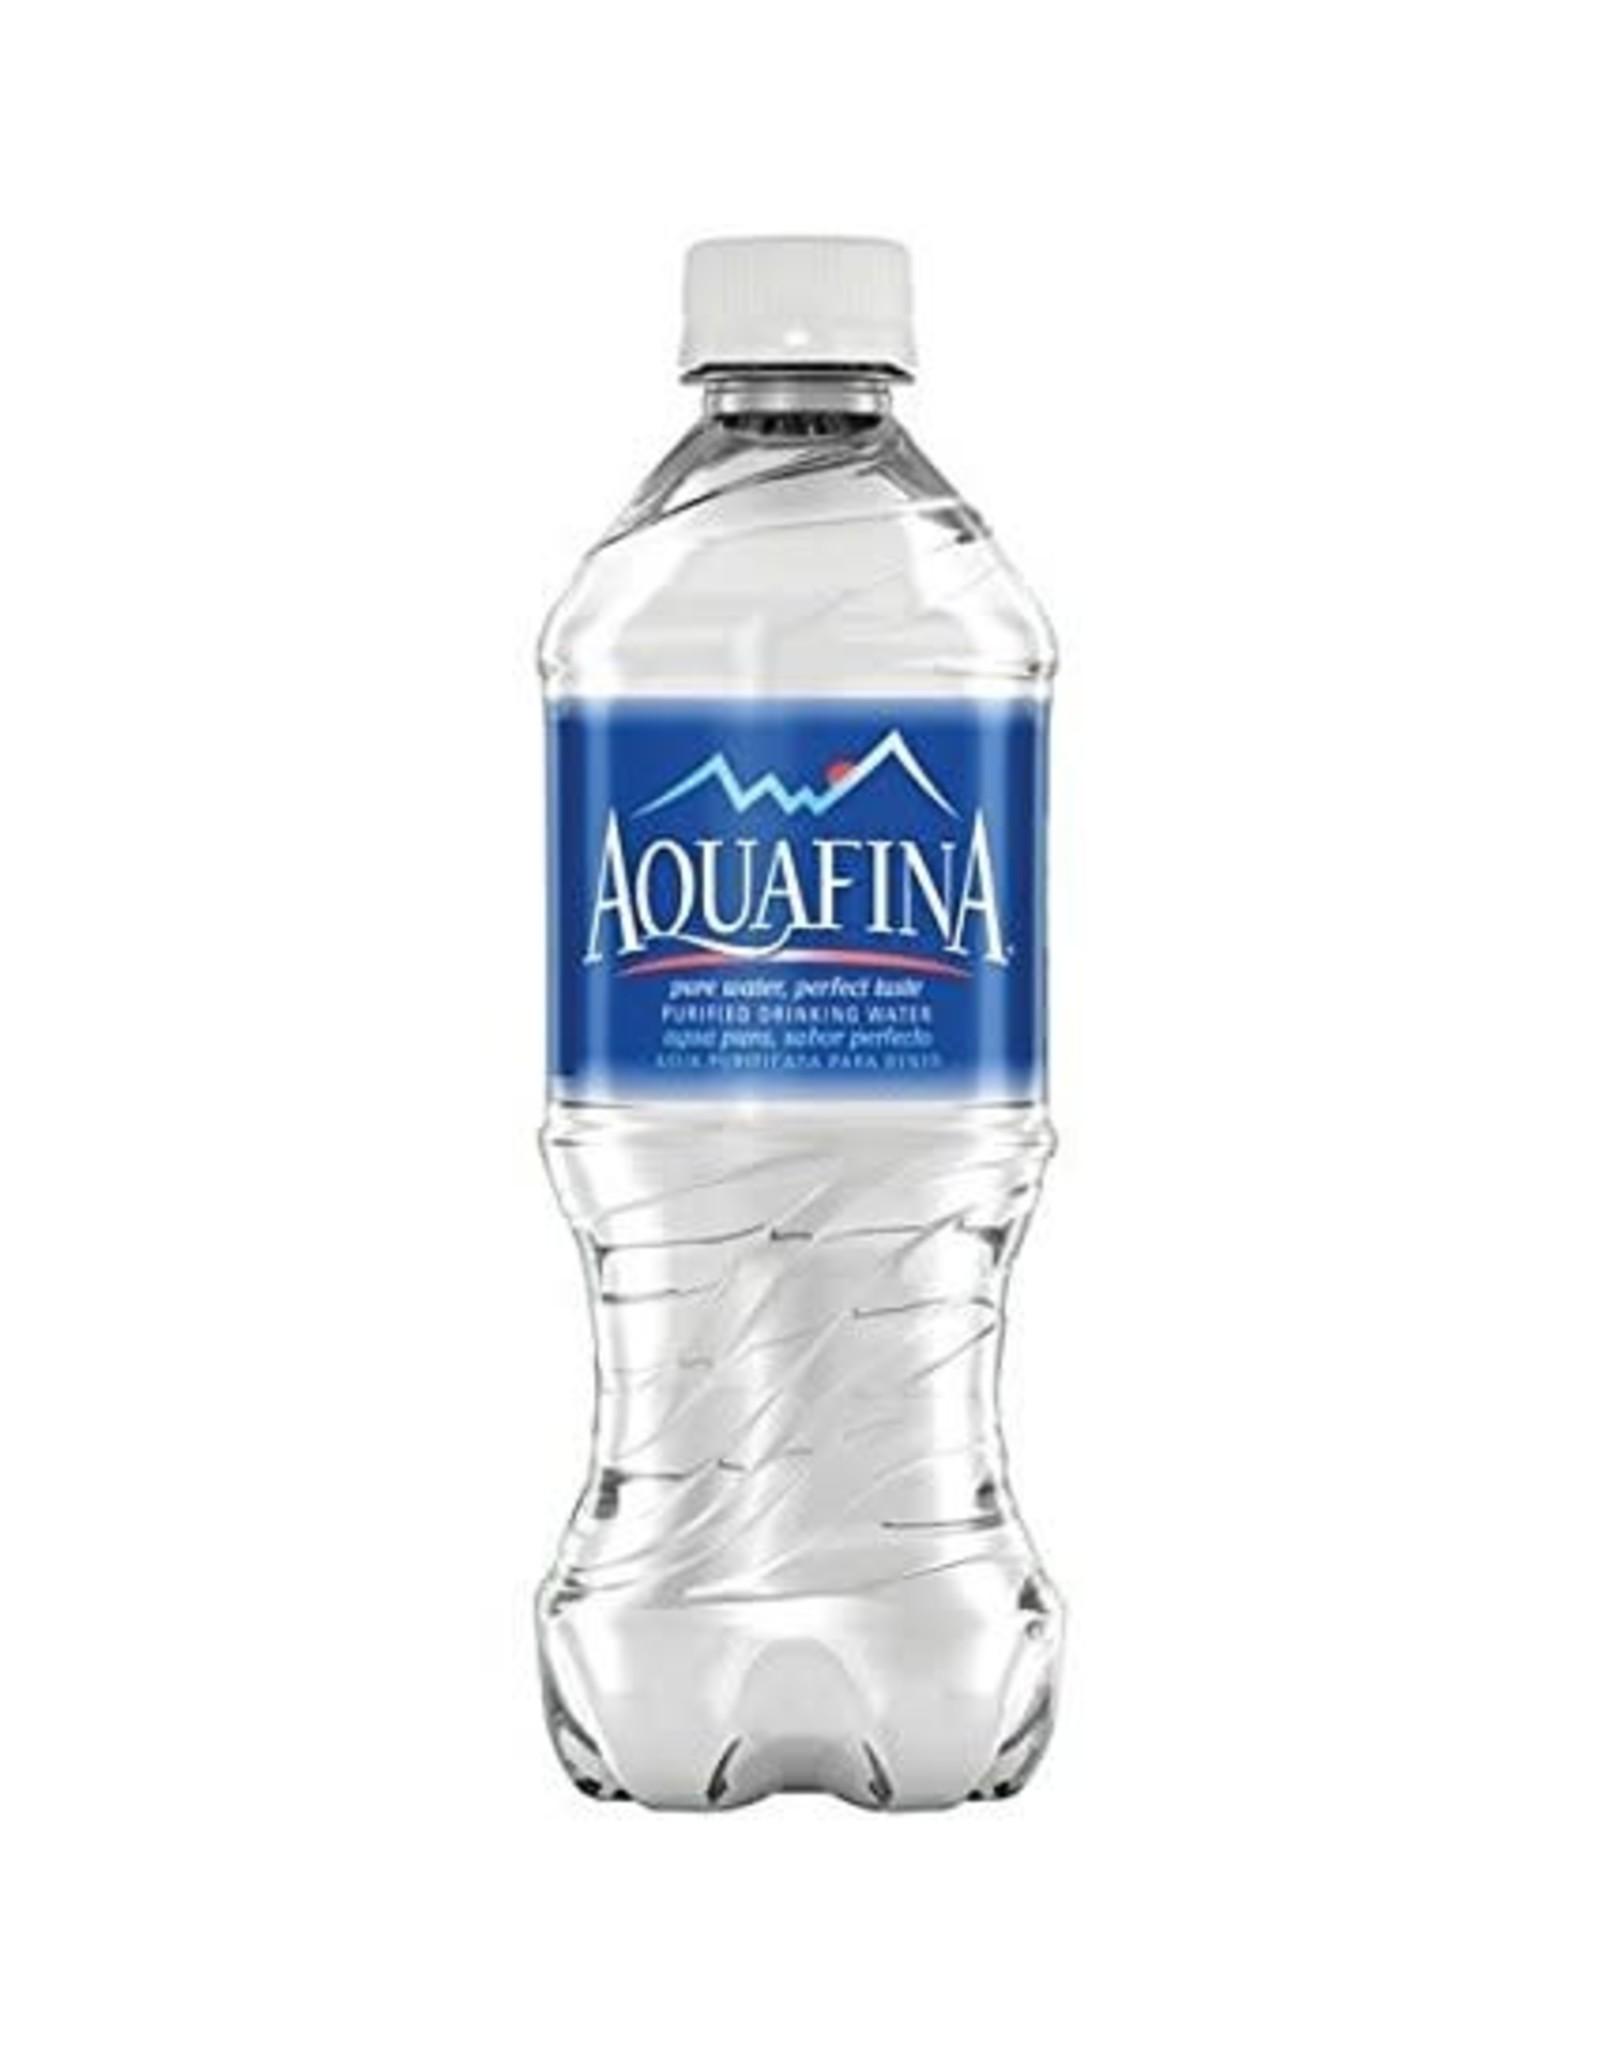 AQUAFINA WATER 20oz